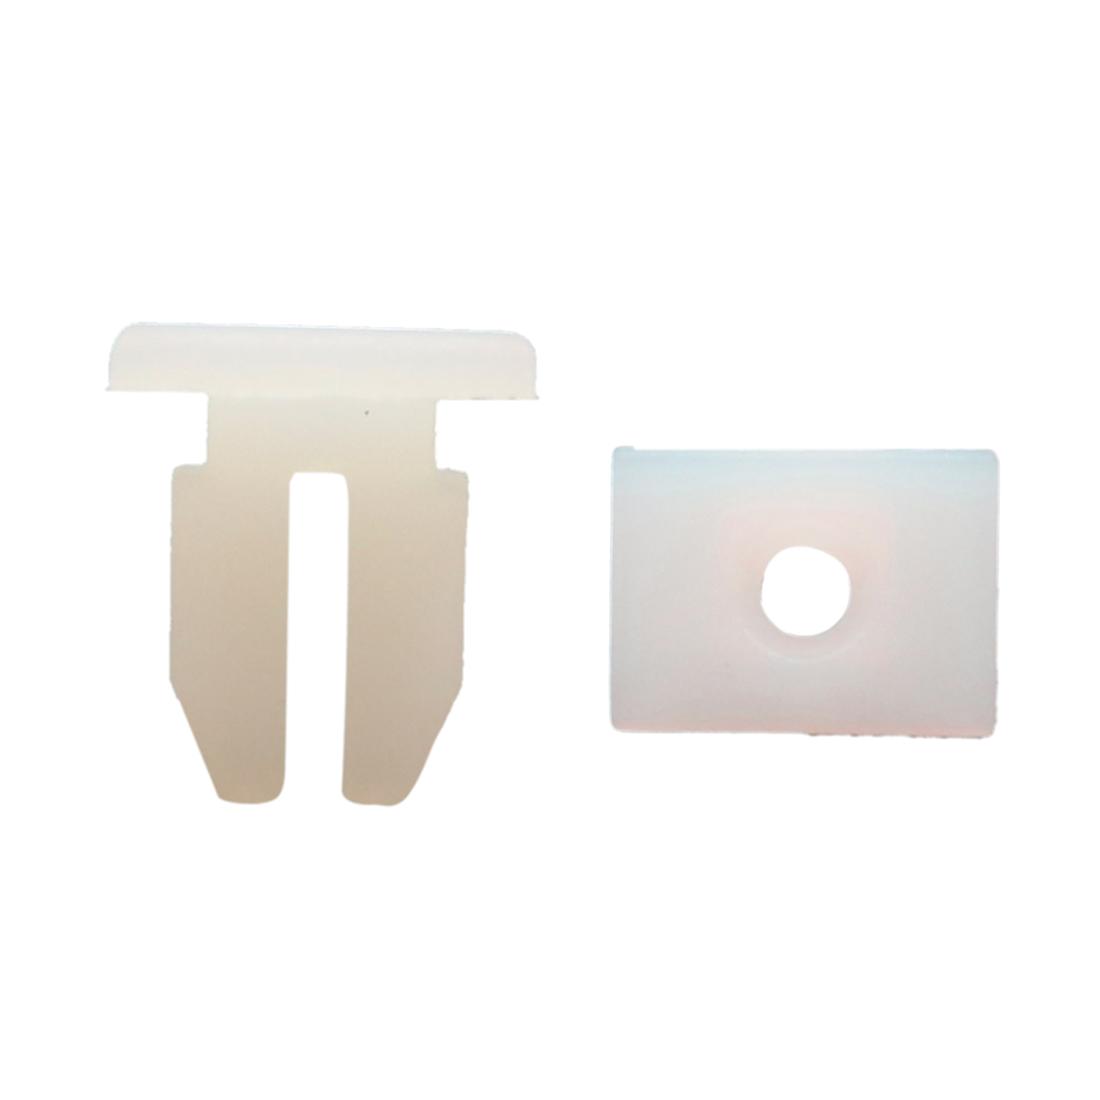 100Pcs White Plastic Rivets Push Type Door Weatherstrip Trim Fastener Clips 10mm